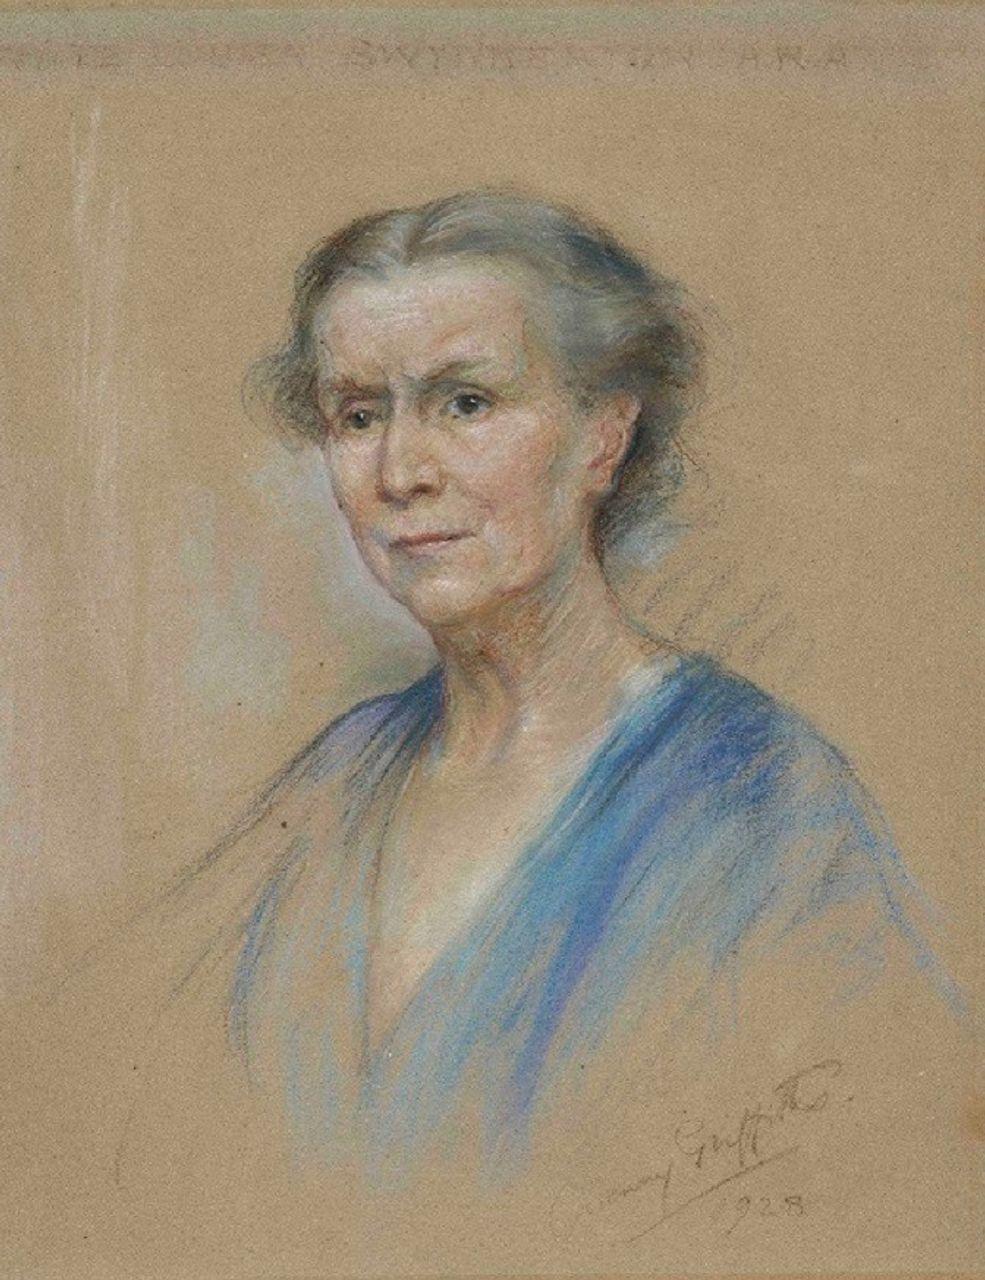 Mrs L Swynnerton, 1928, by Gwenny Griffiths, courtesy of Manchester Art Gallery